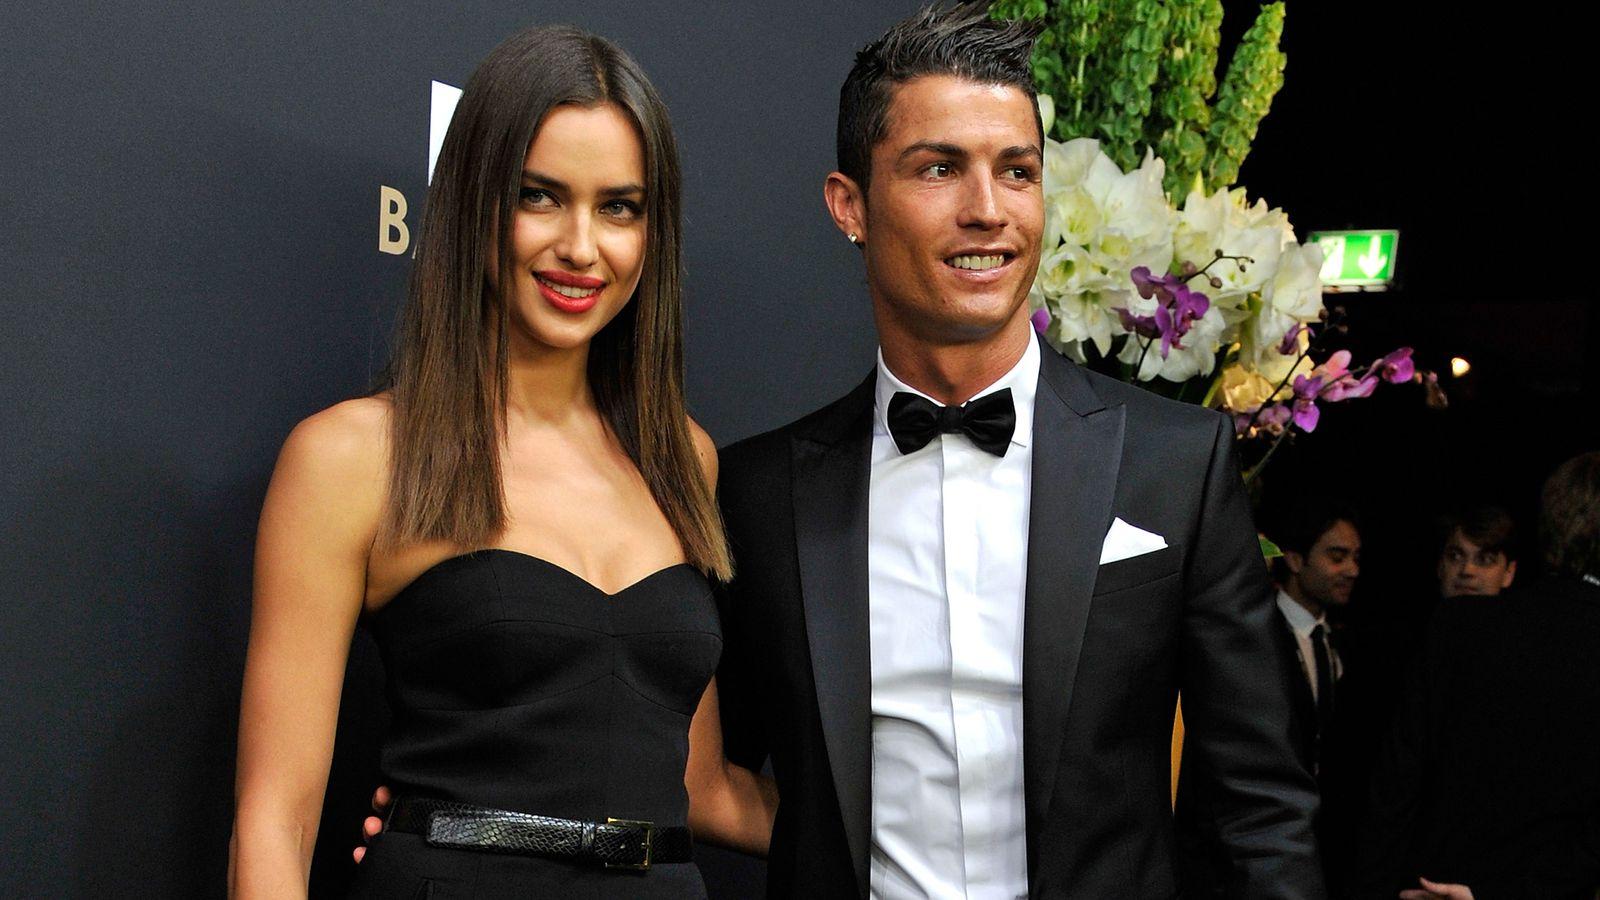 Backheel Breakfast: Sepp Blatter allegedly dated Cristiano